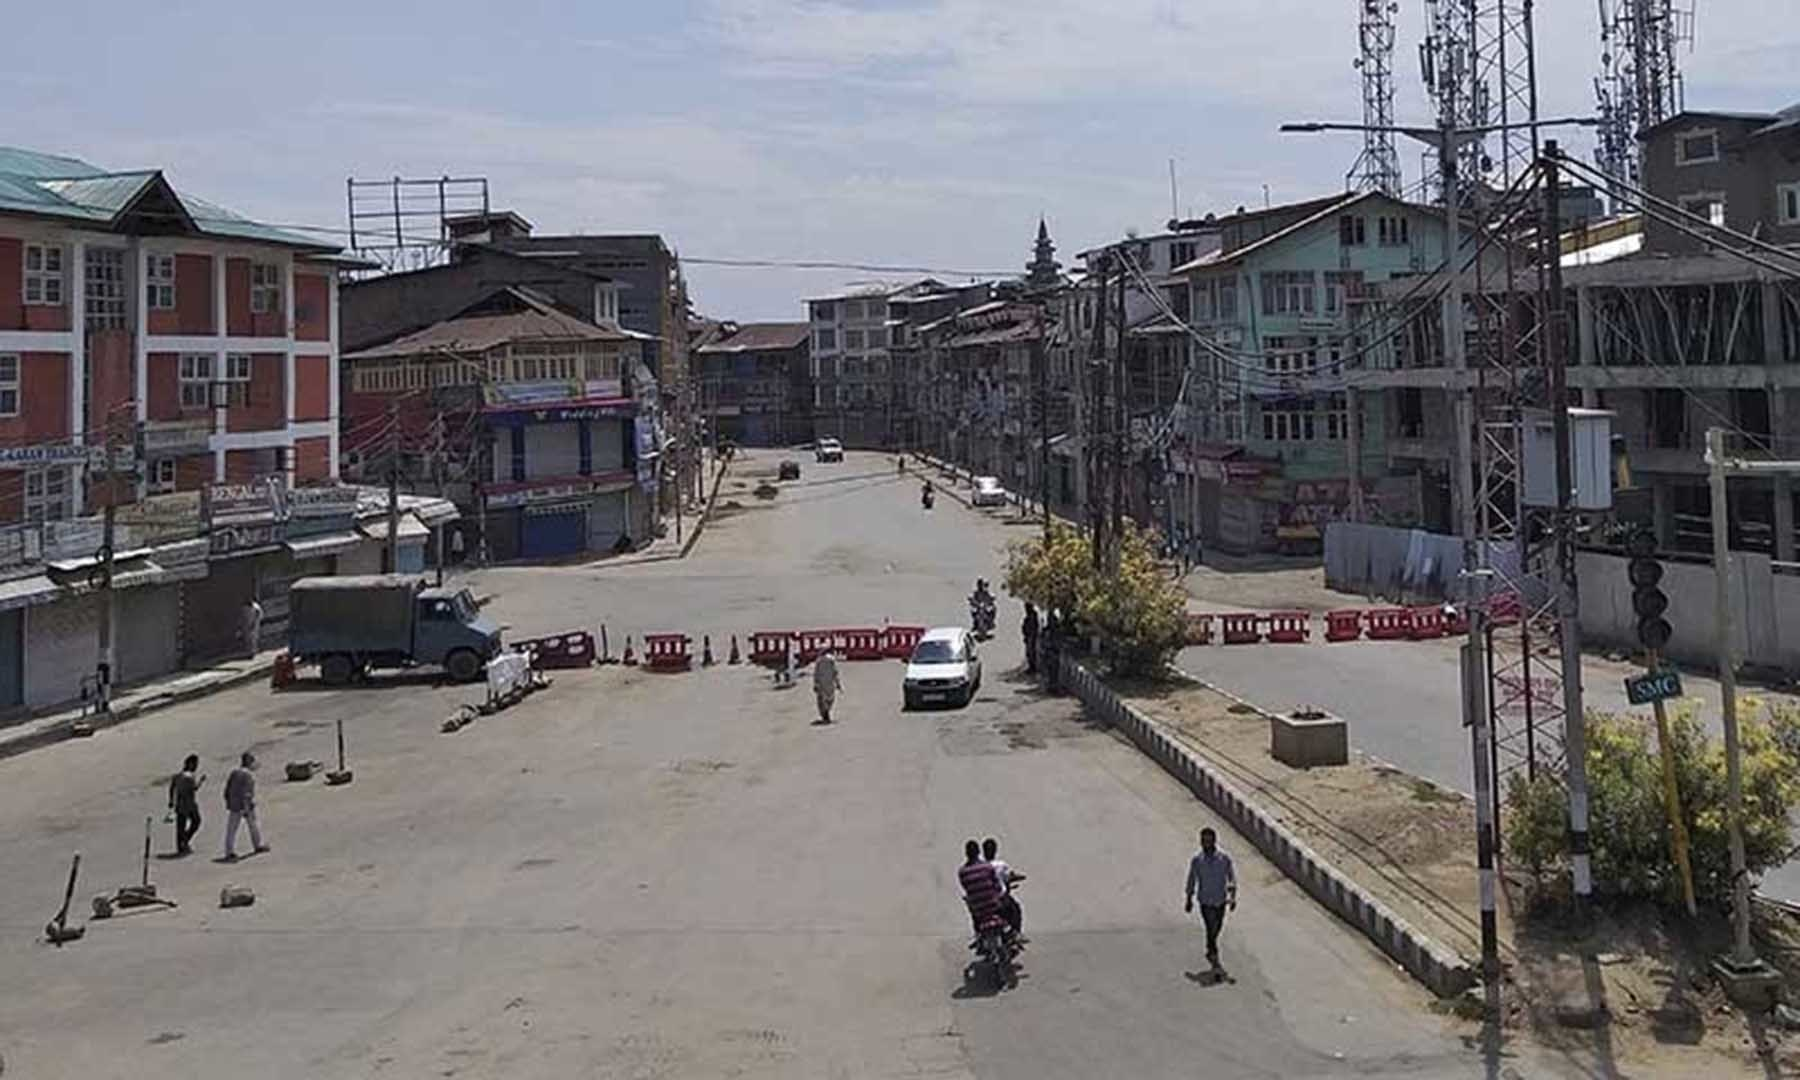 Pedestrians move on a deserted street in Srinagar in occupied Kashmir on Aug 9. — AP